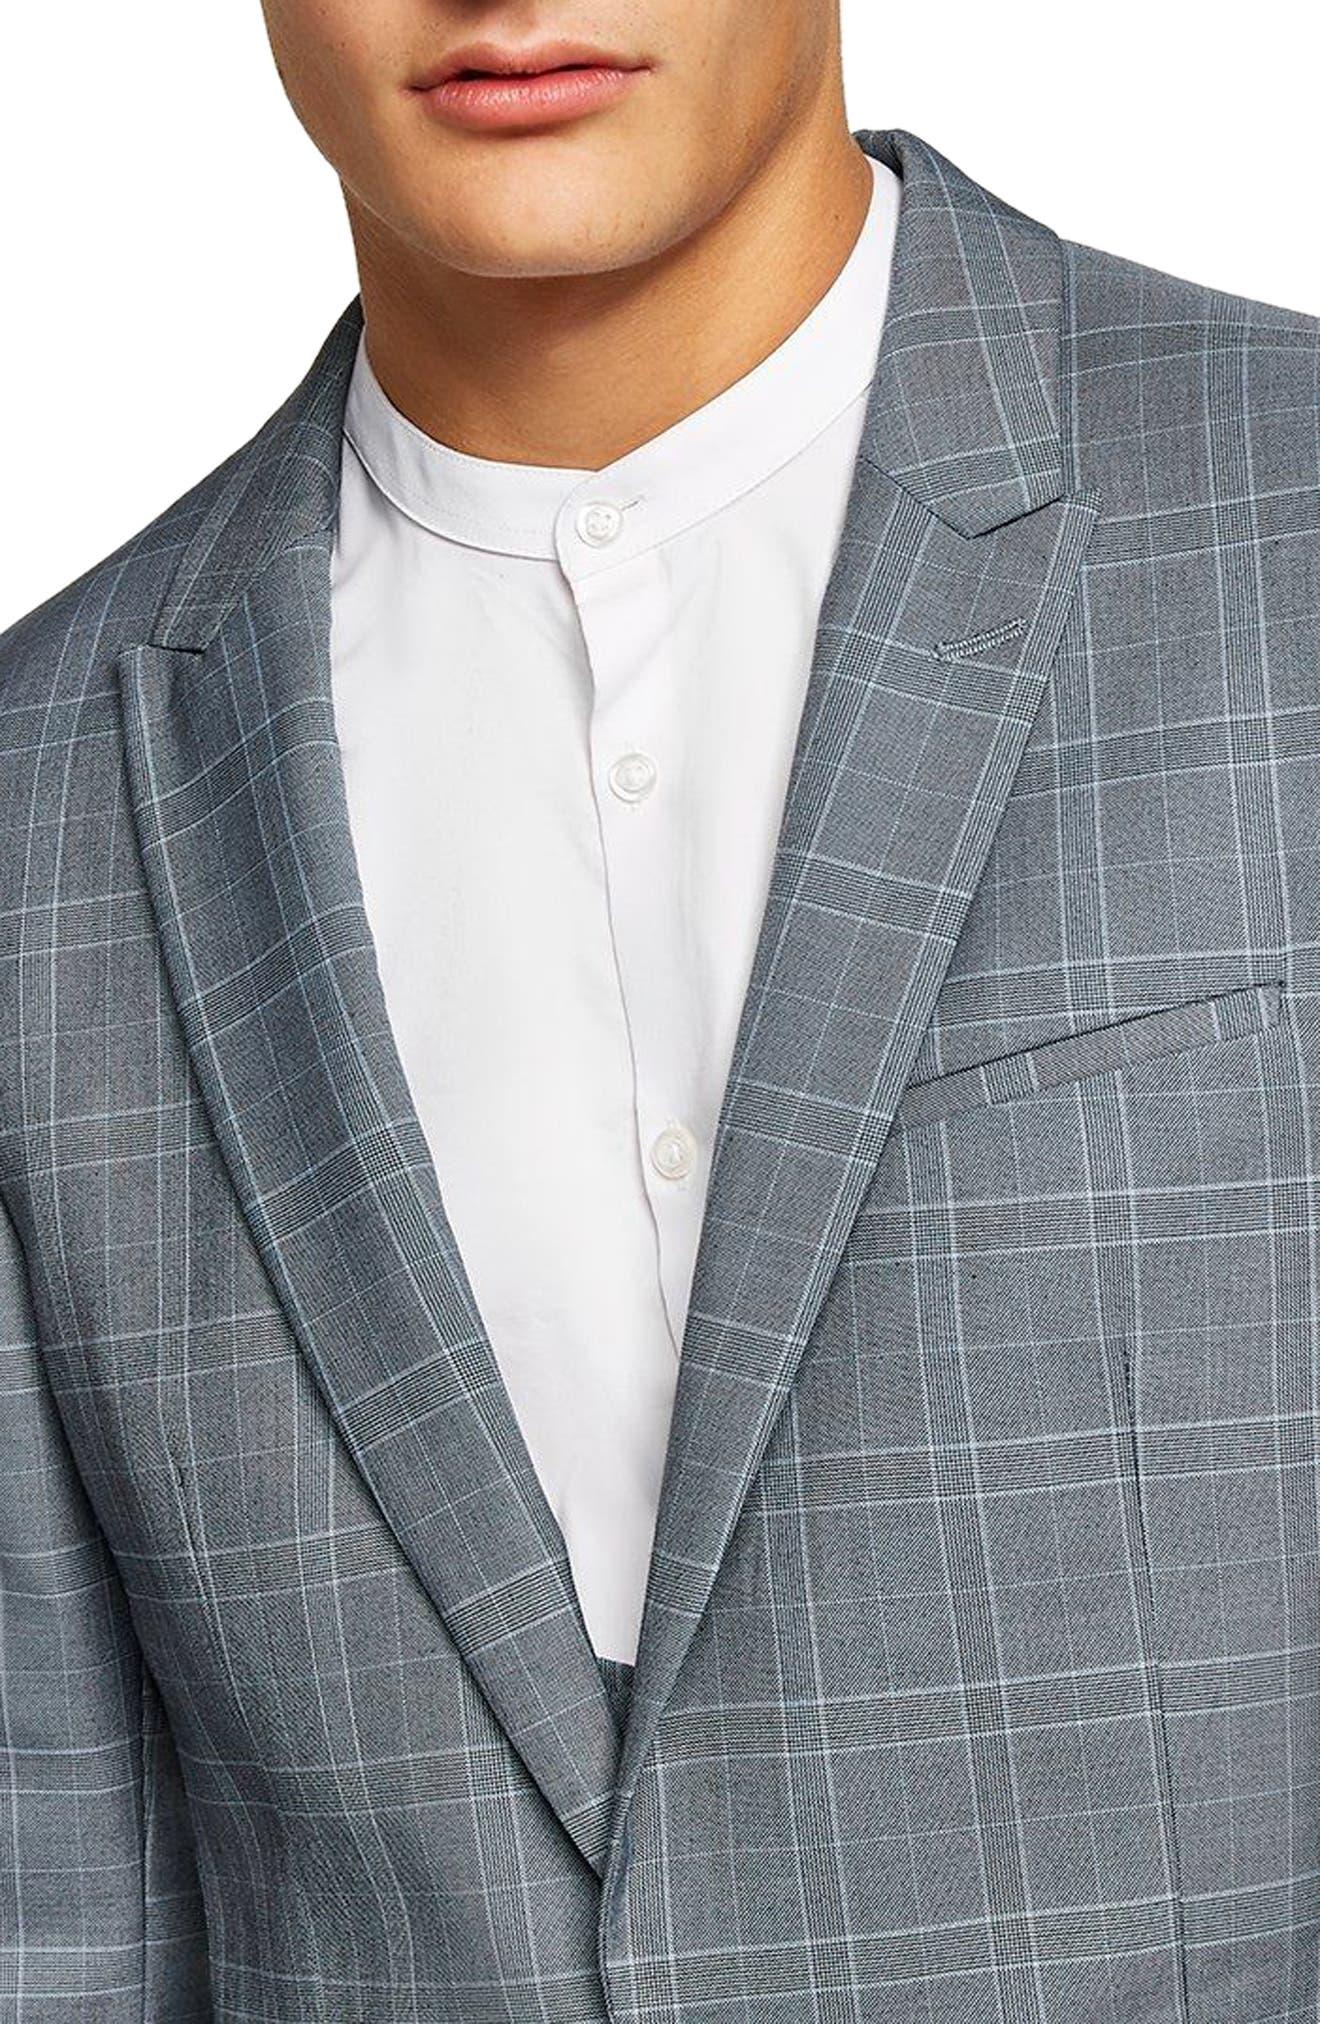 Skinny Fit Check Suit Jacket,                             Alternate thumbnail 3, color,                             Blue Multi